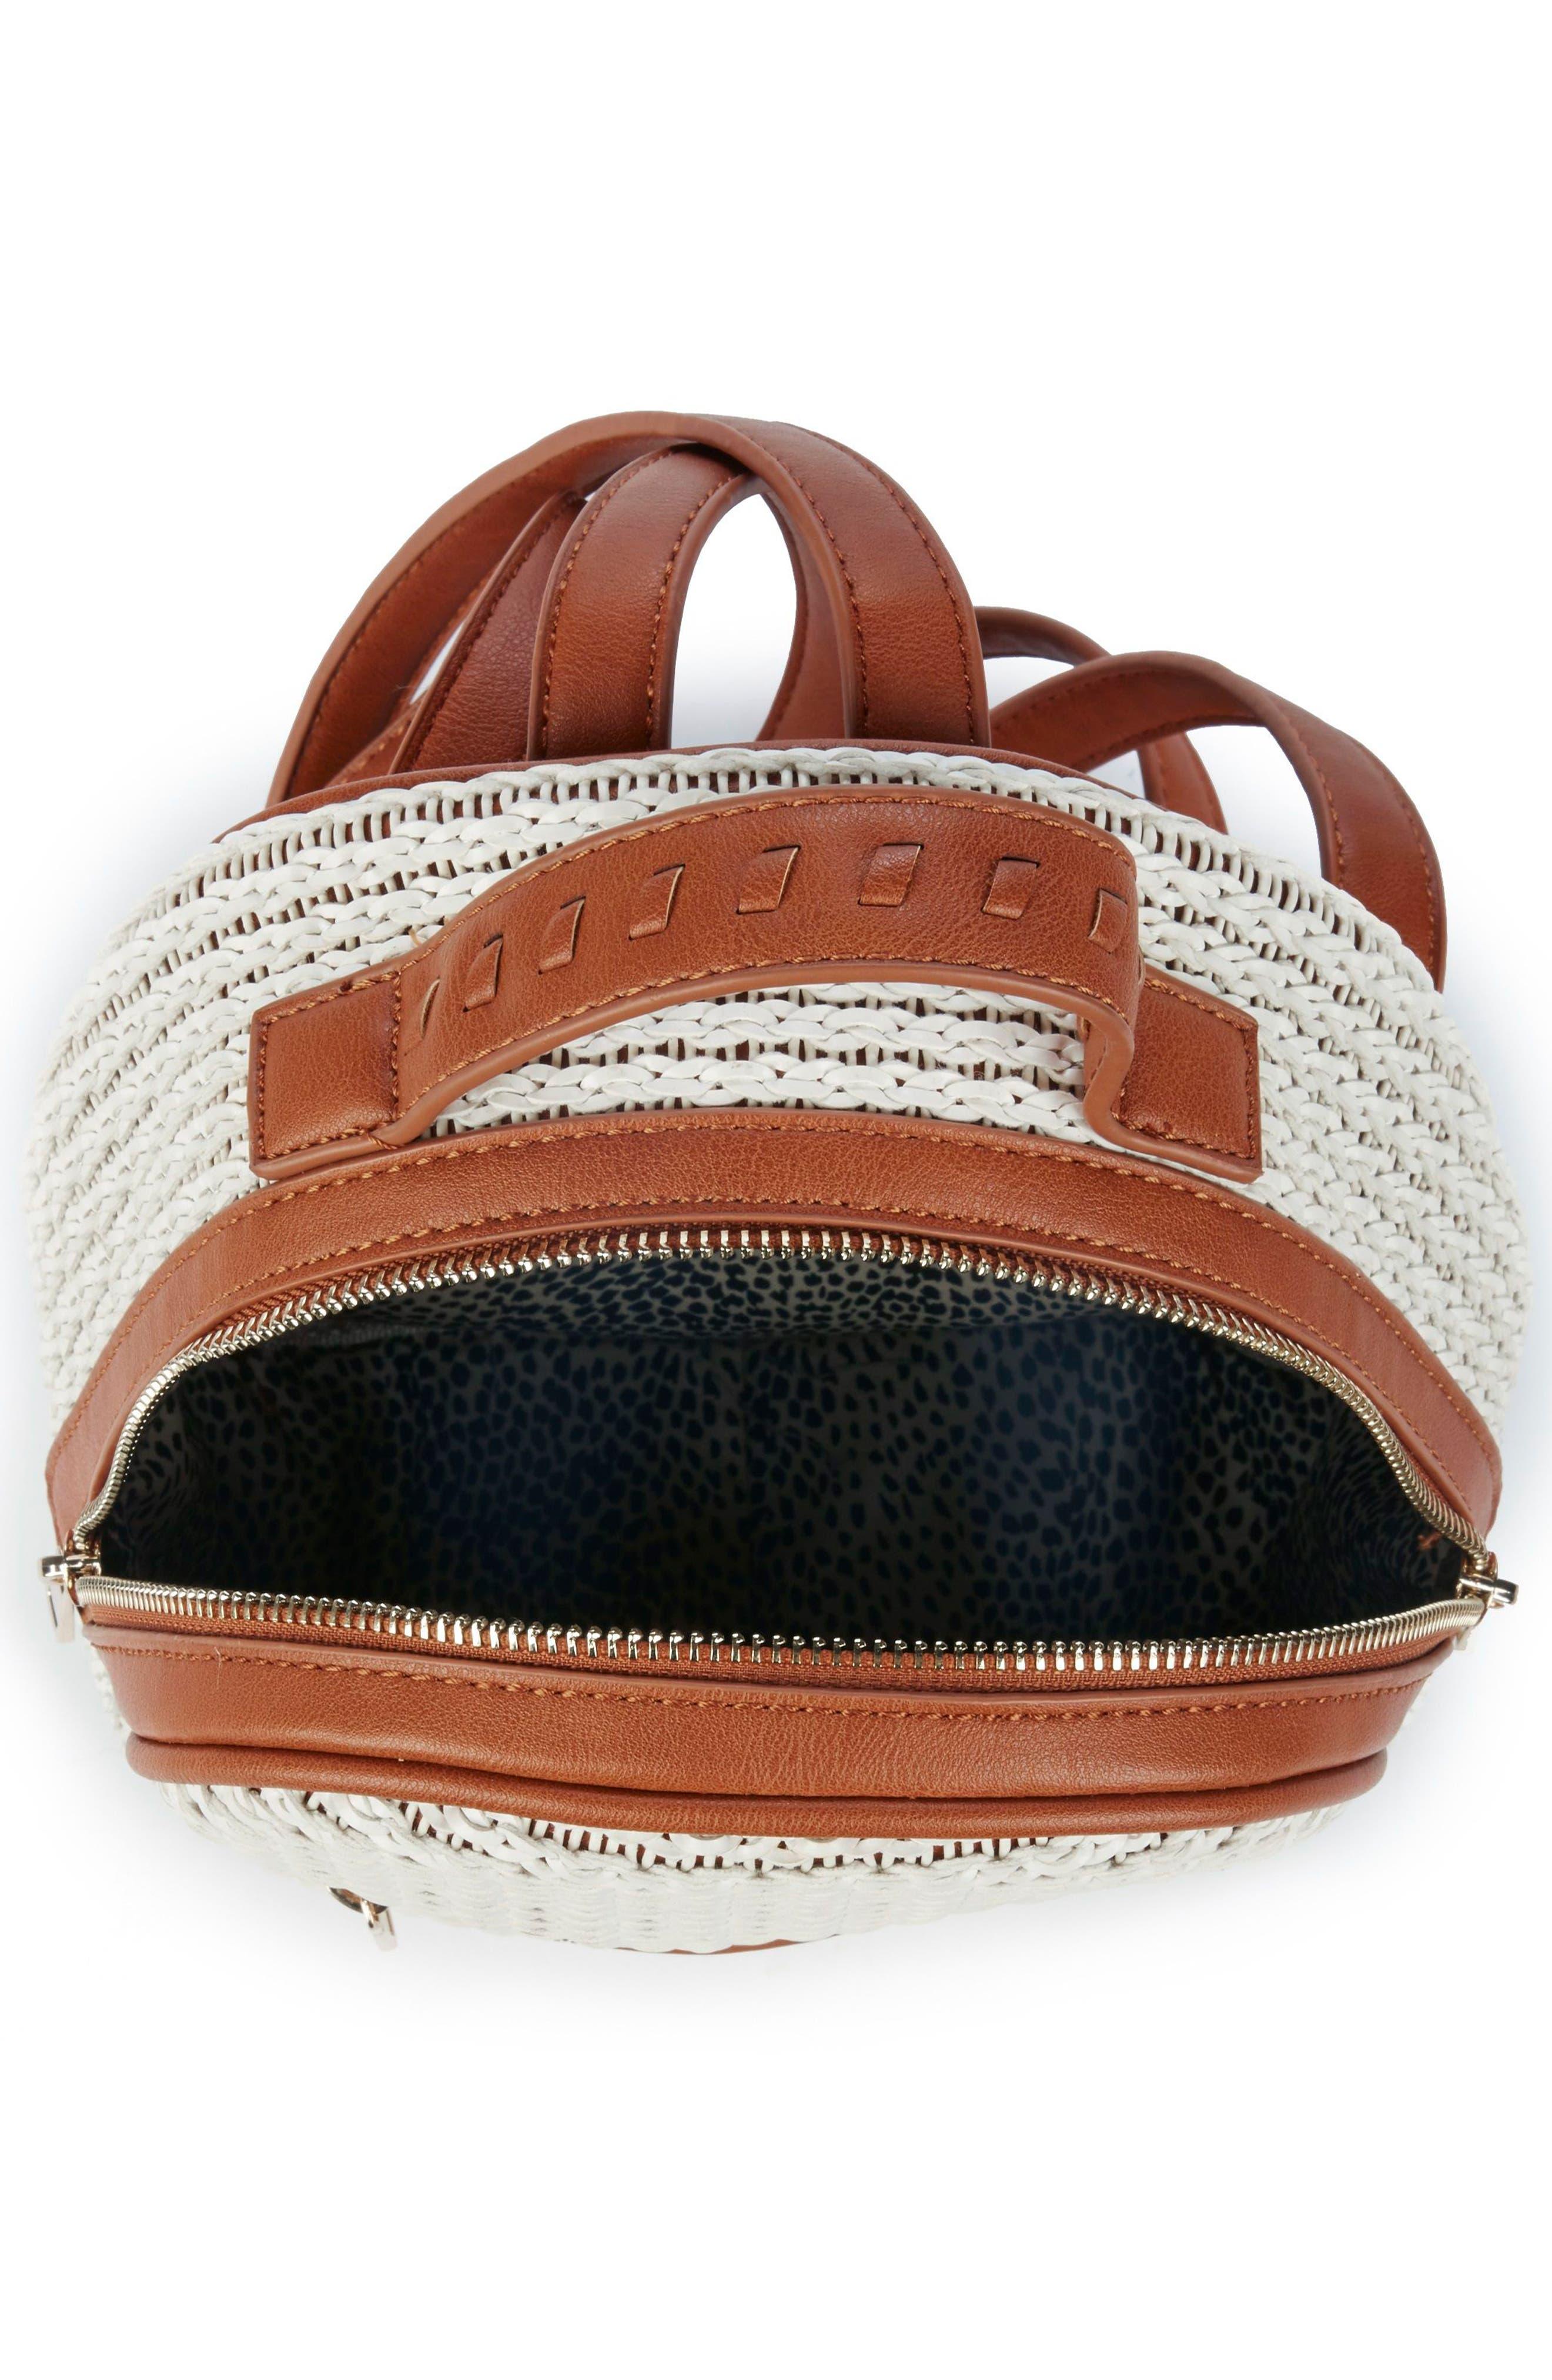 Nikole Faux Leather Backpack,                             Alternate thumbnail 3, color,                             Camel